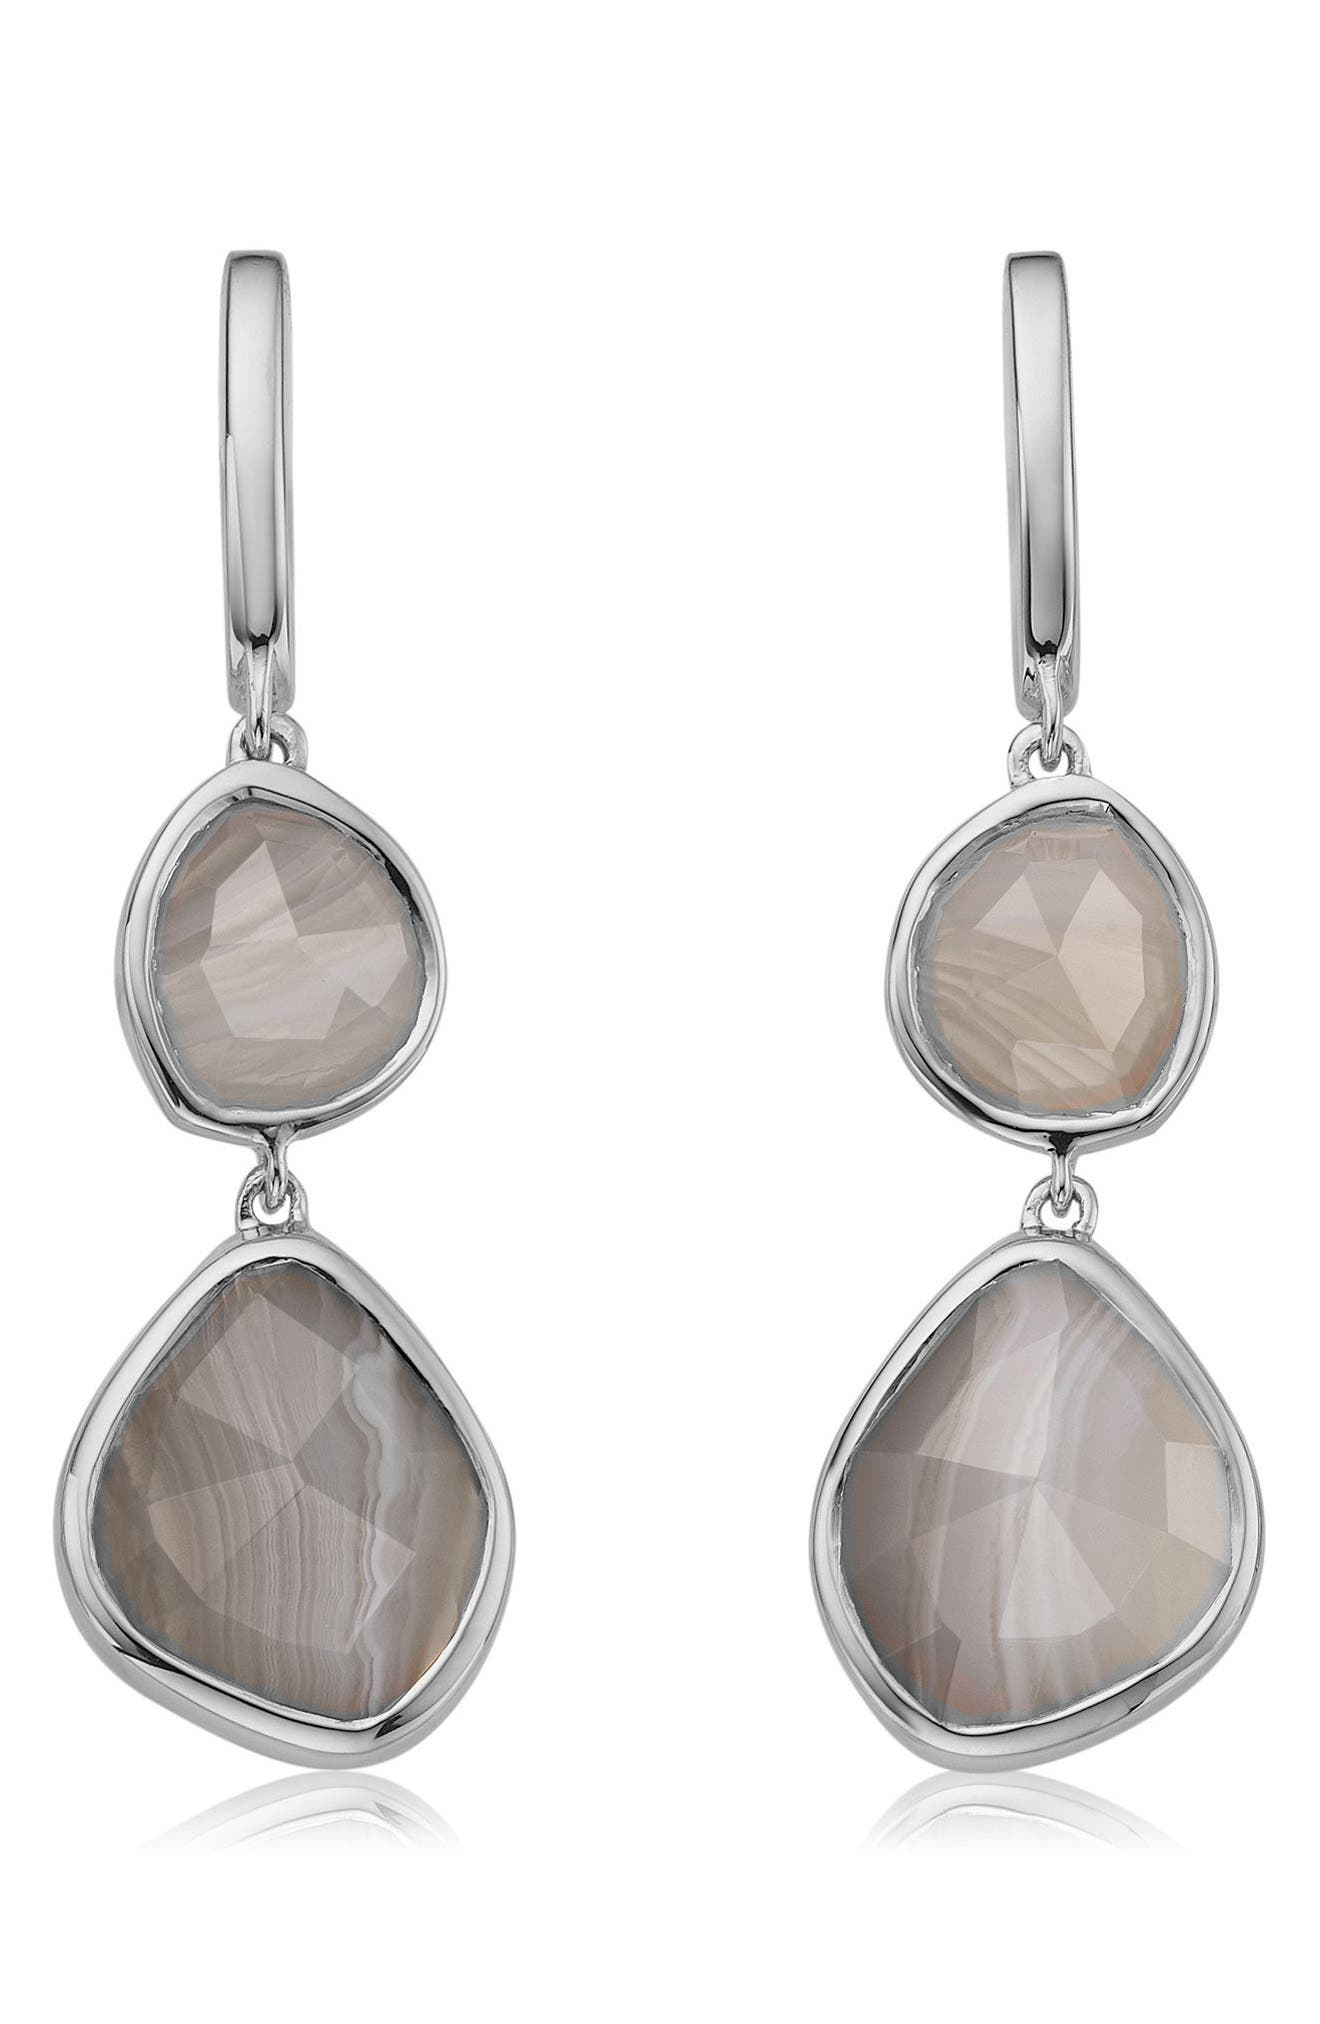 Siren Nugget Semiprecious Stone Drop Earrings,                         Main,                         color, Silver/ Grey Agate